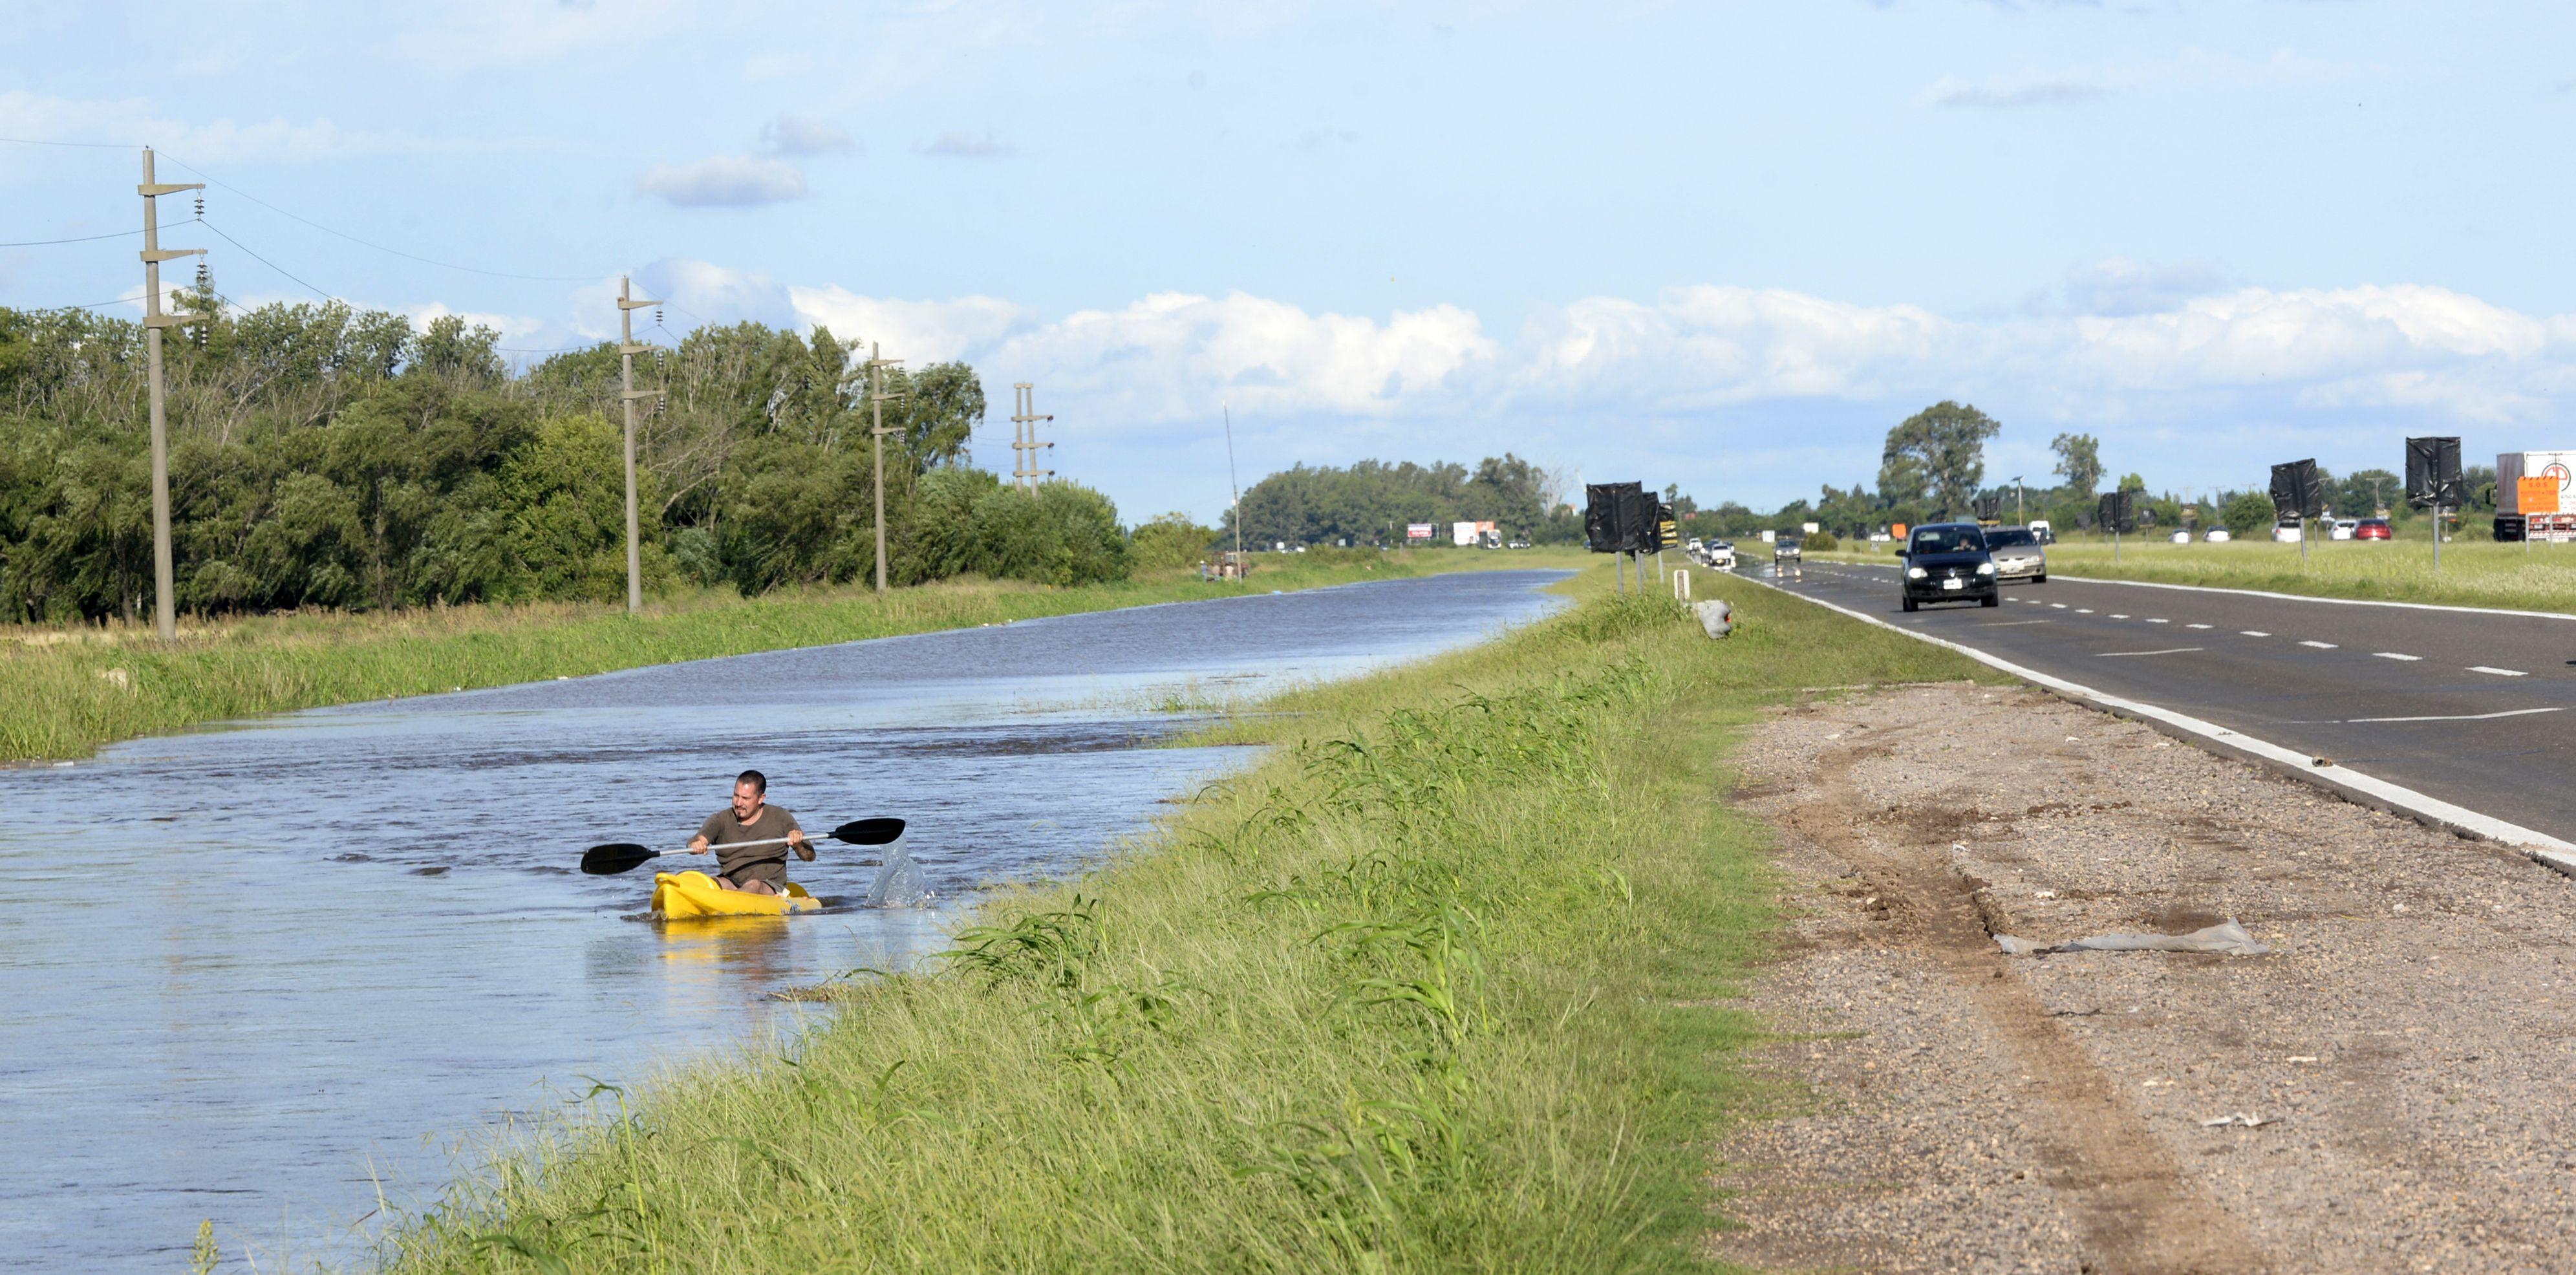 Ocurrente. Un kayakista aprovechó la laguna temporaria que se formó en la banquina de la autopista